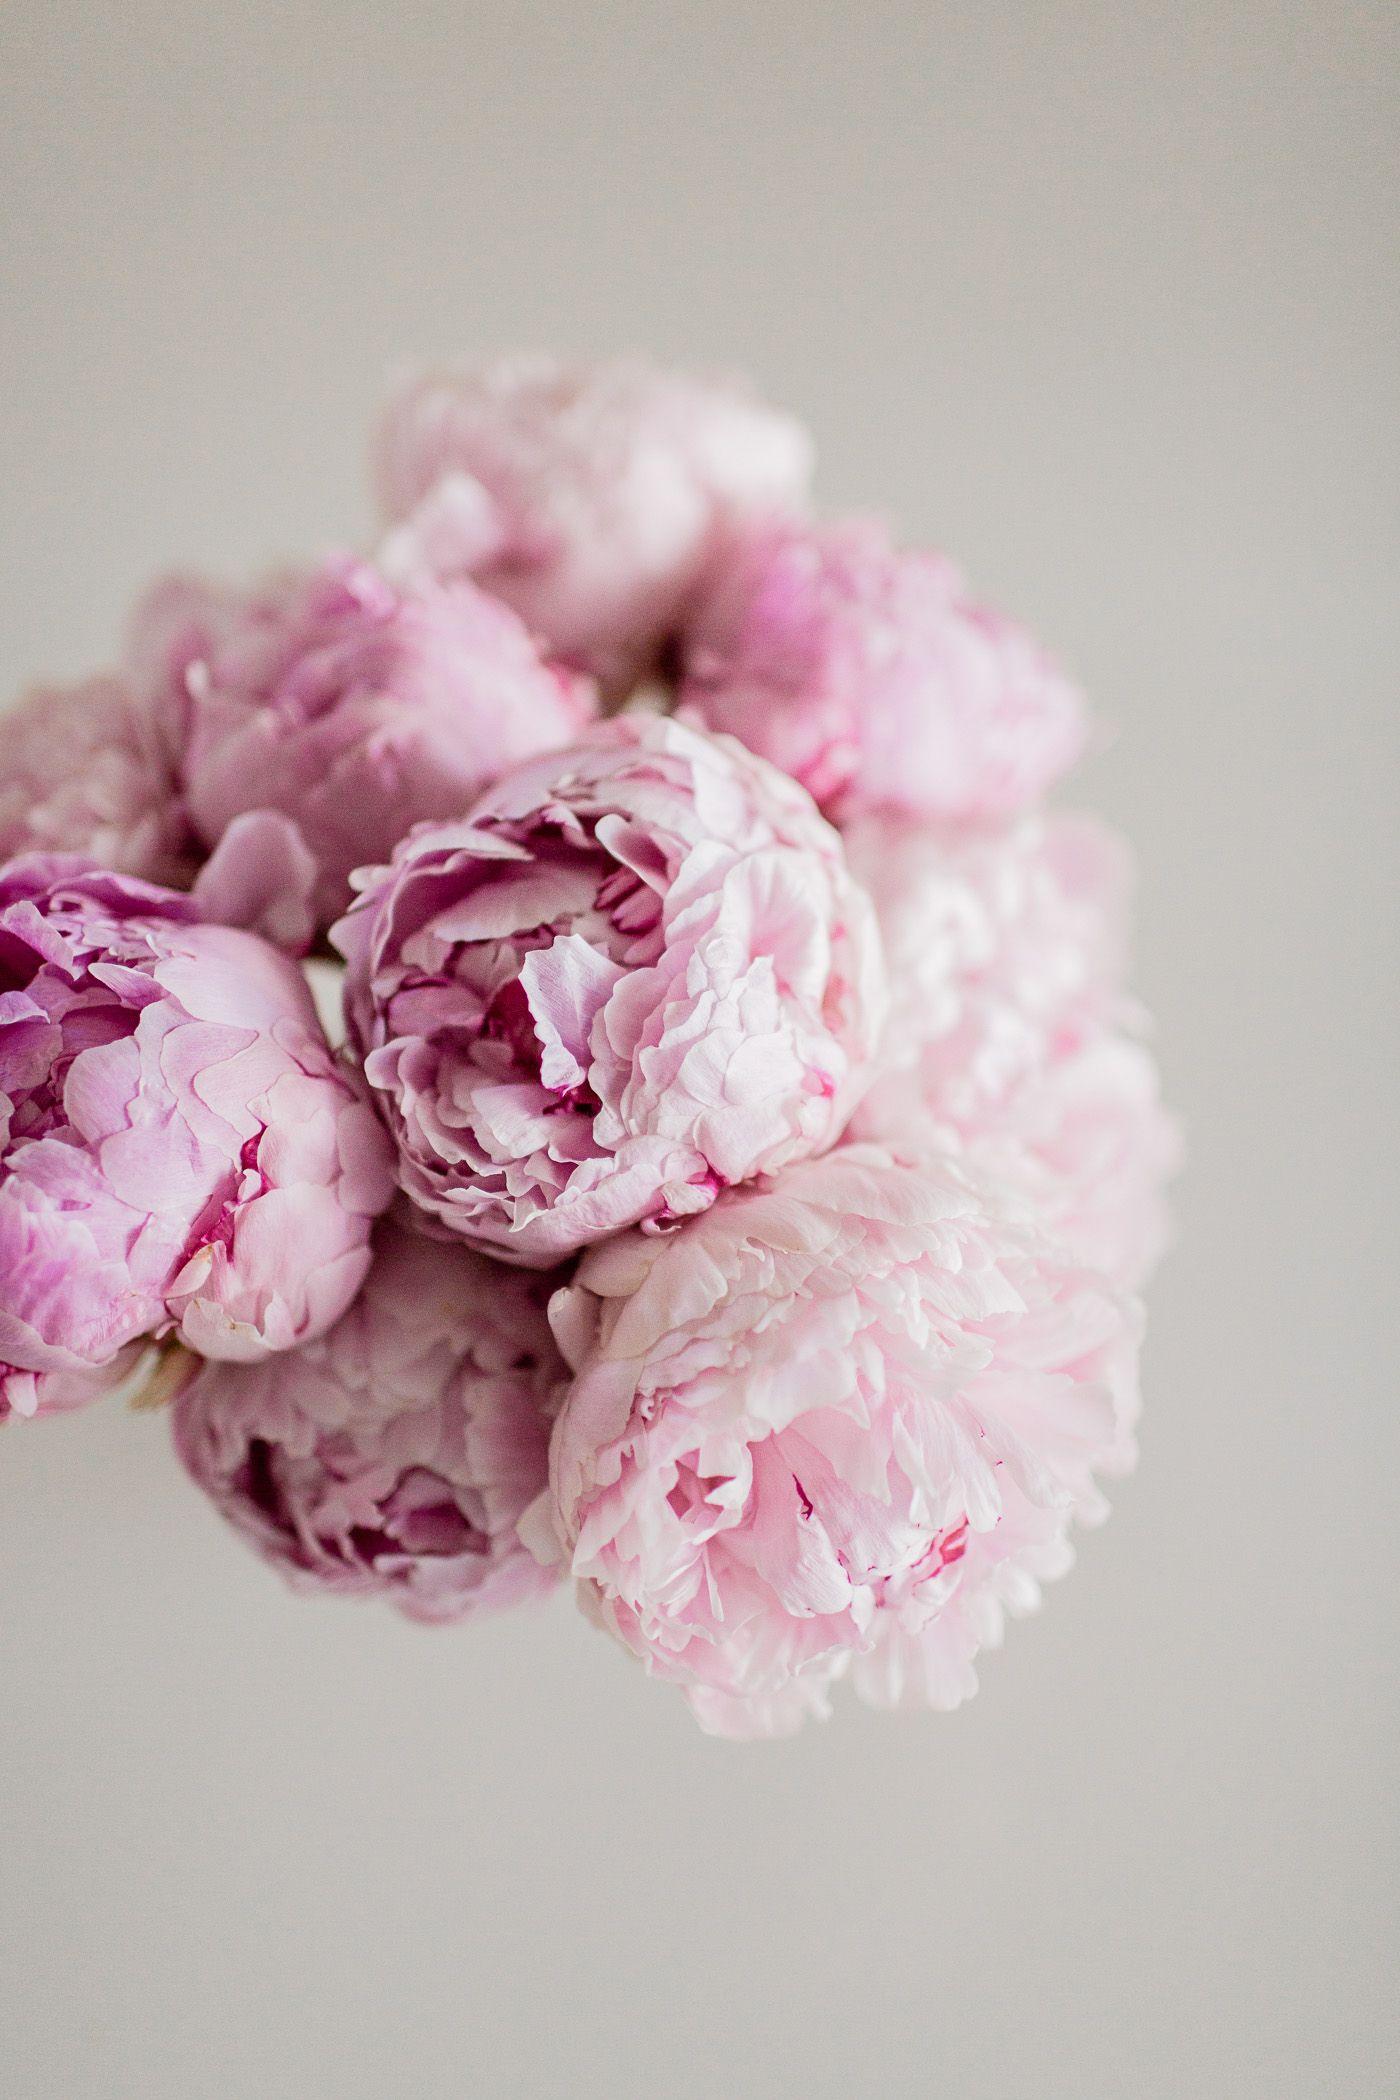 The Pink Peonies pink peonies | life / floral & garden | pinterest | peony, flowers